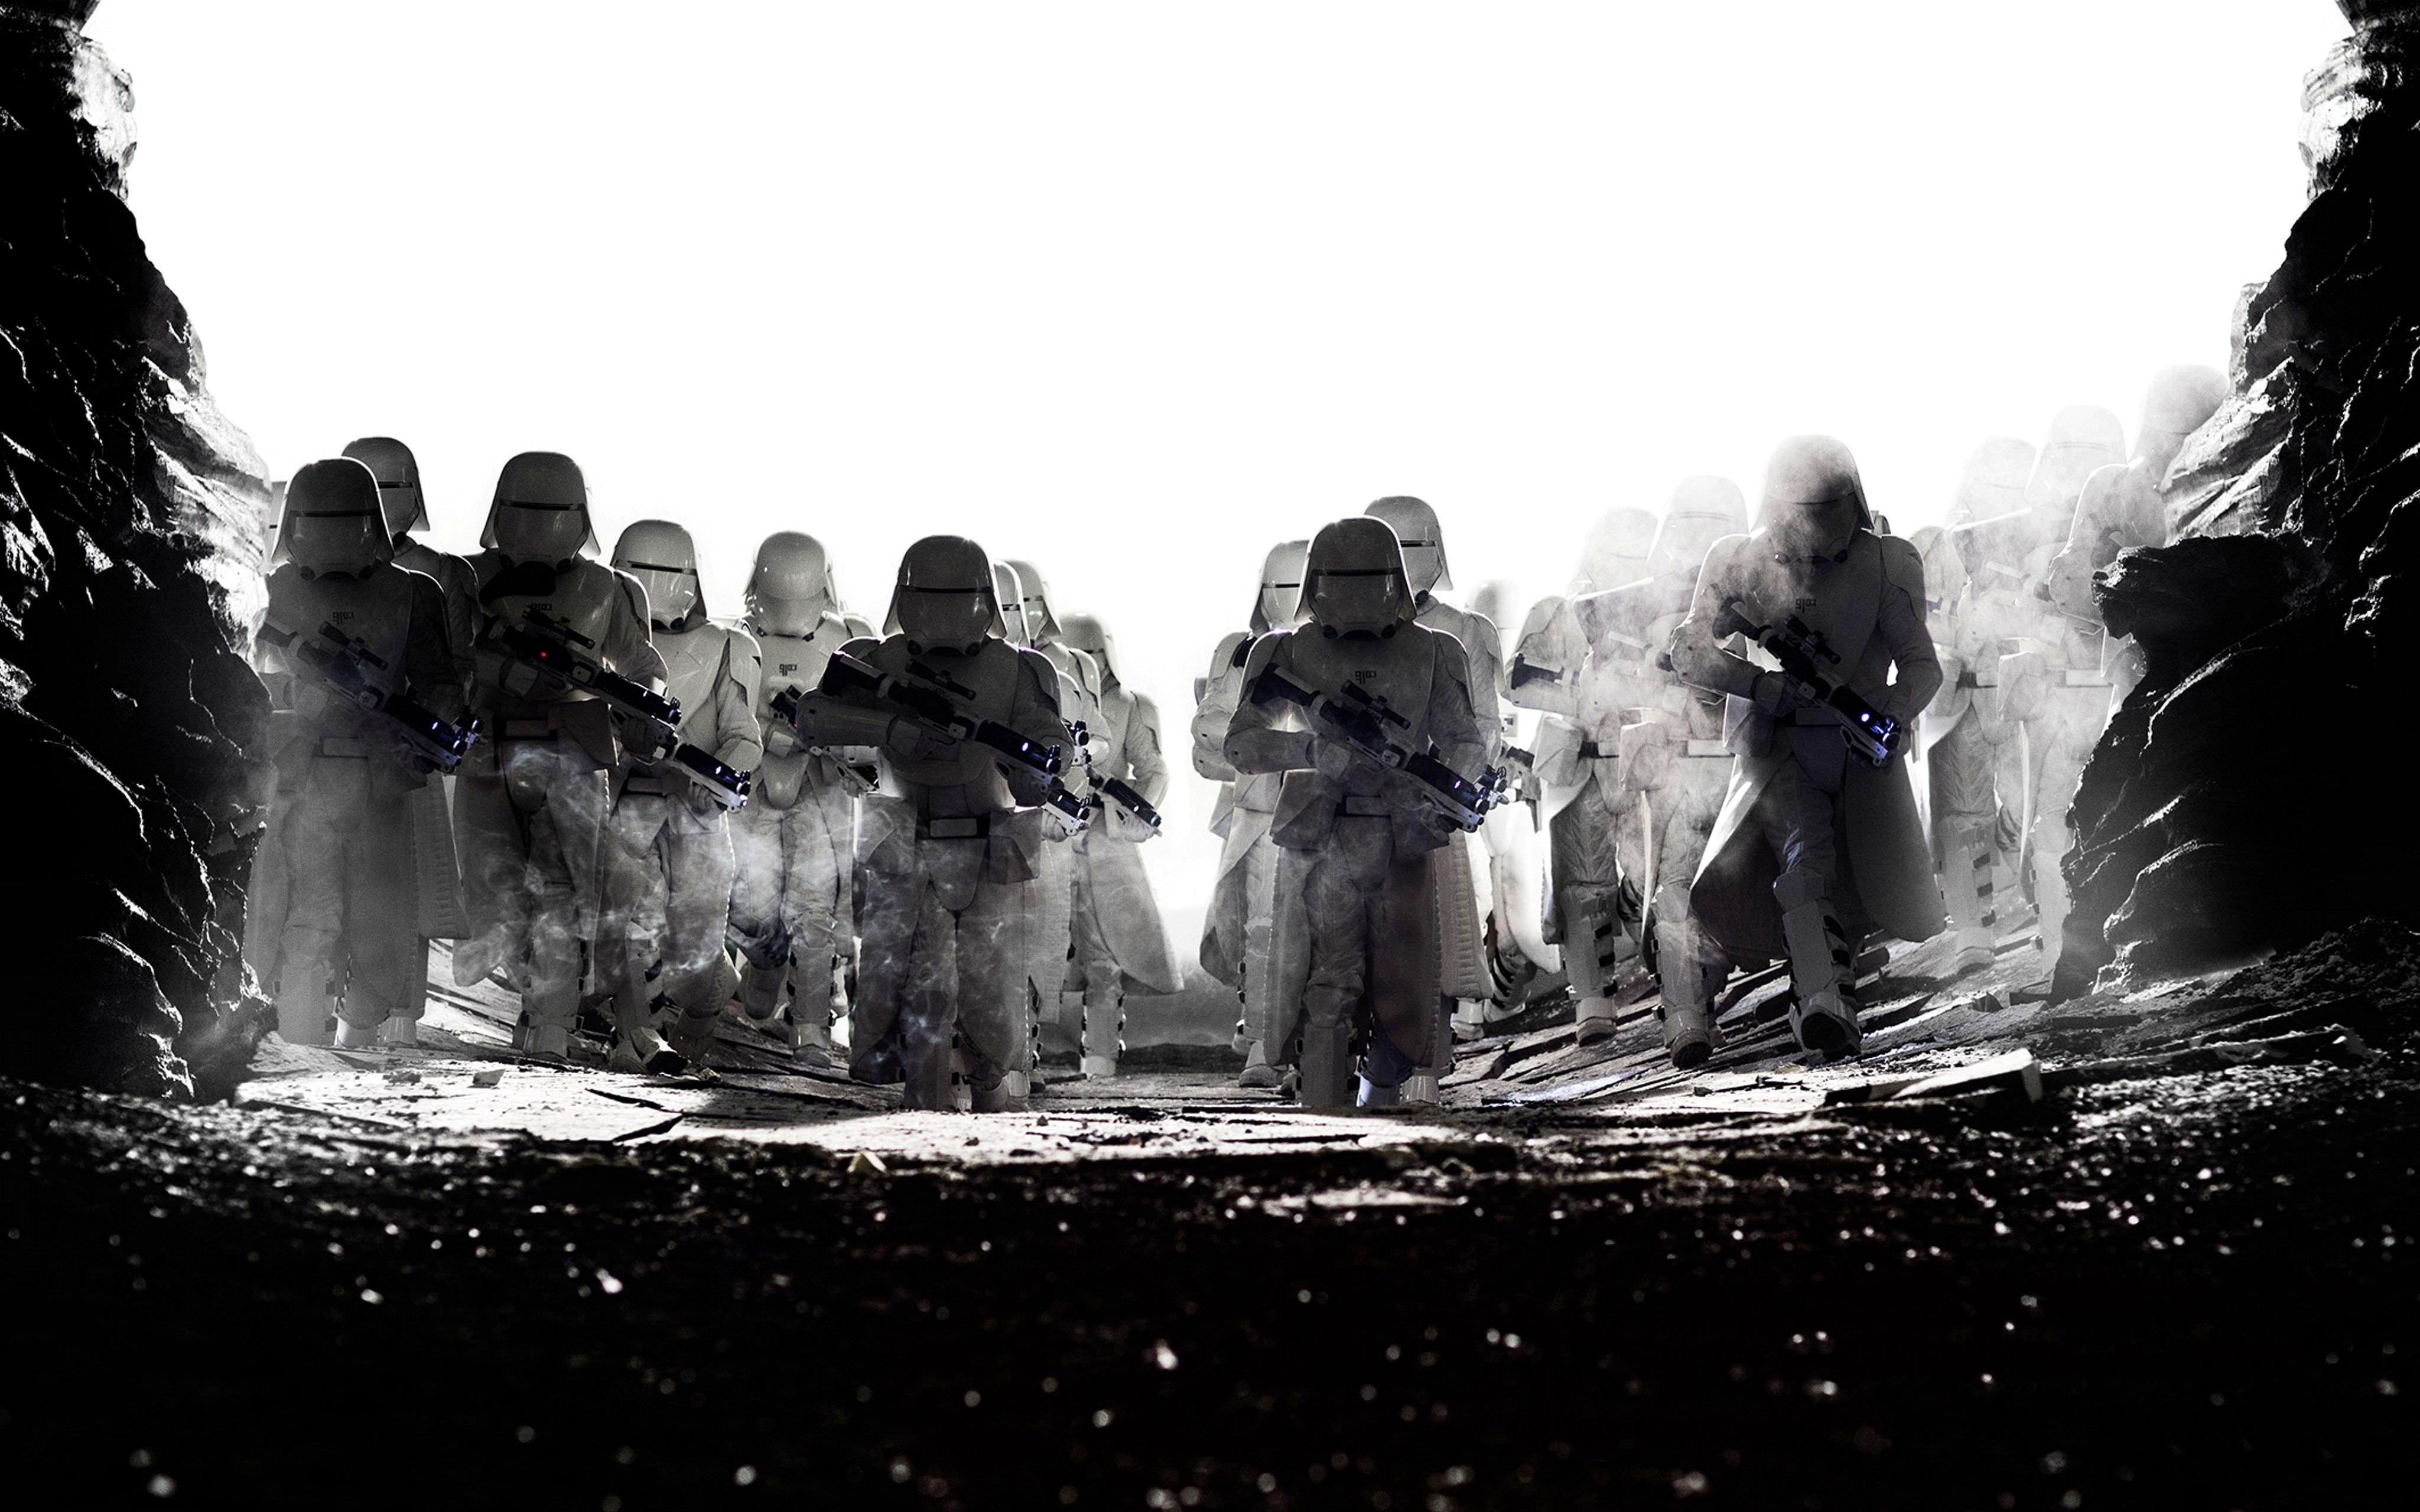 Wallpaper 4k Star Wars The Last Jedi Snowtroopers 4k Cure Jedi